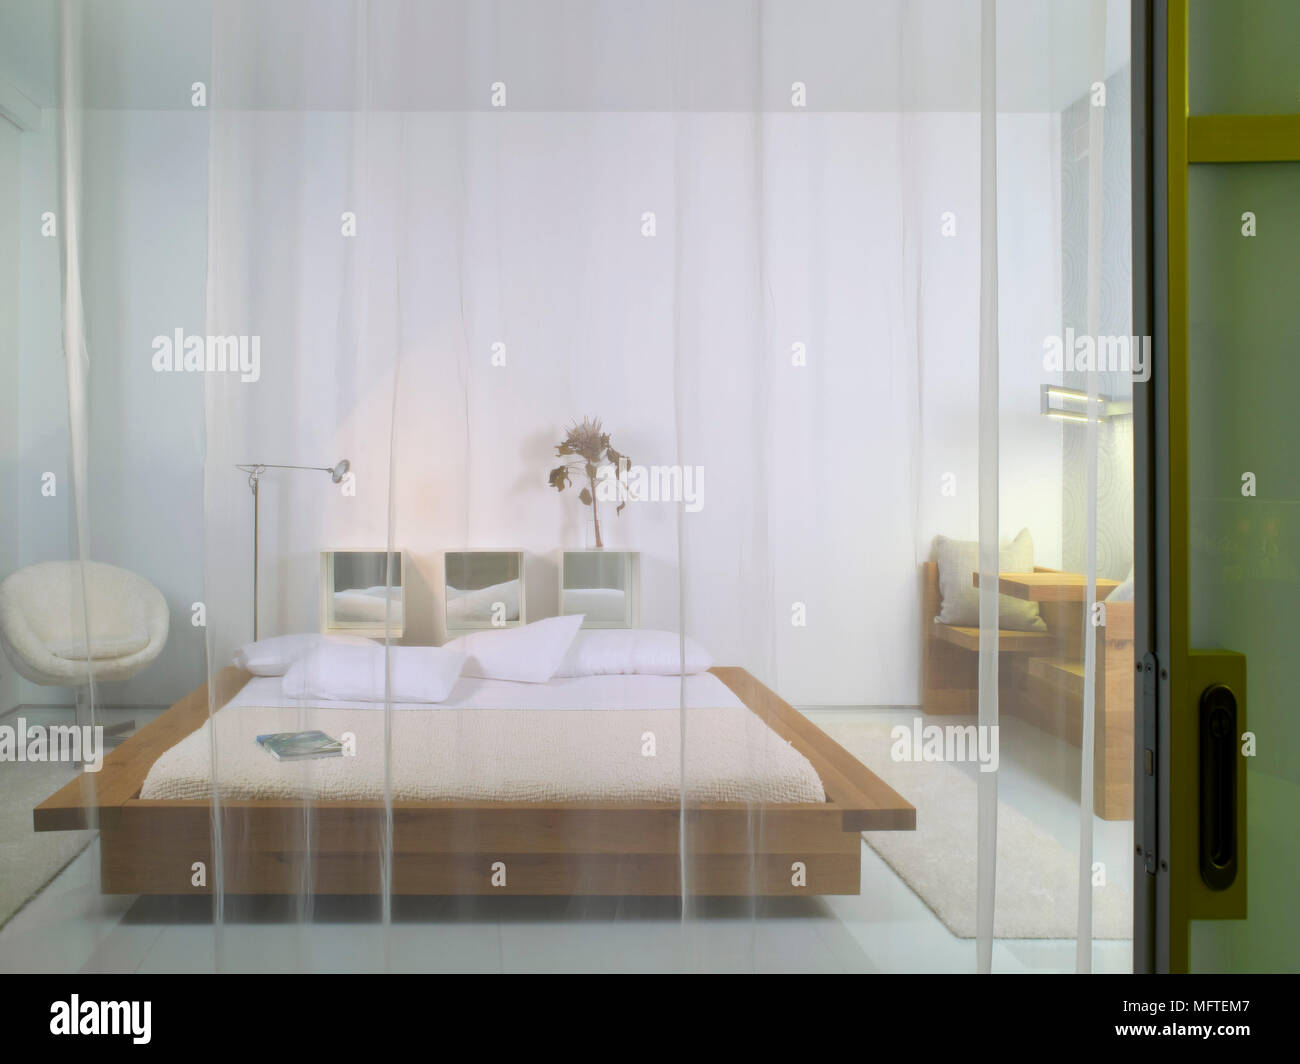 Wooden Platform Bed In Modern Bedroom Seen Through Sheer Curtain Stock Photo Alamy